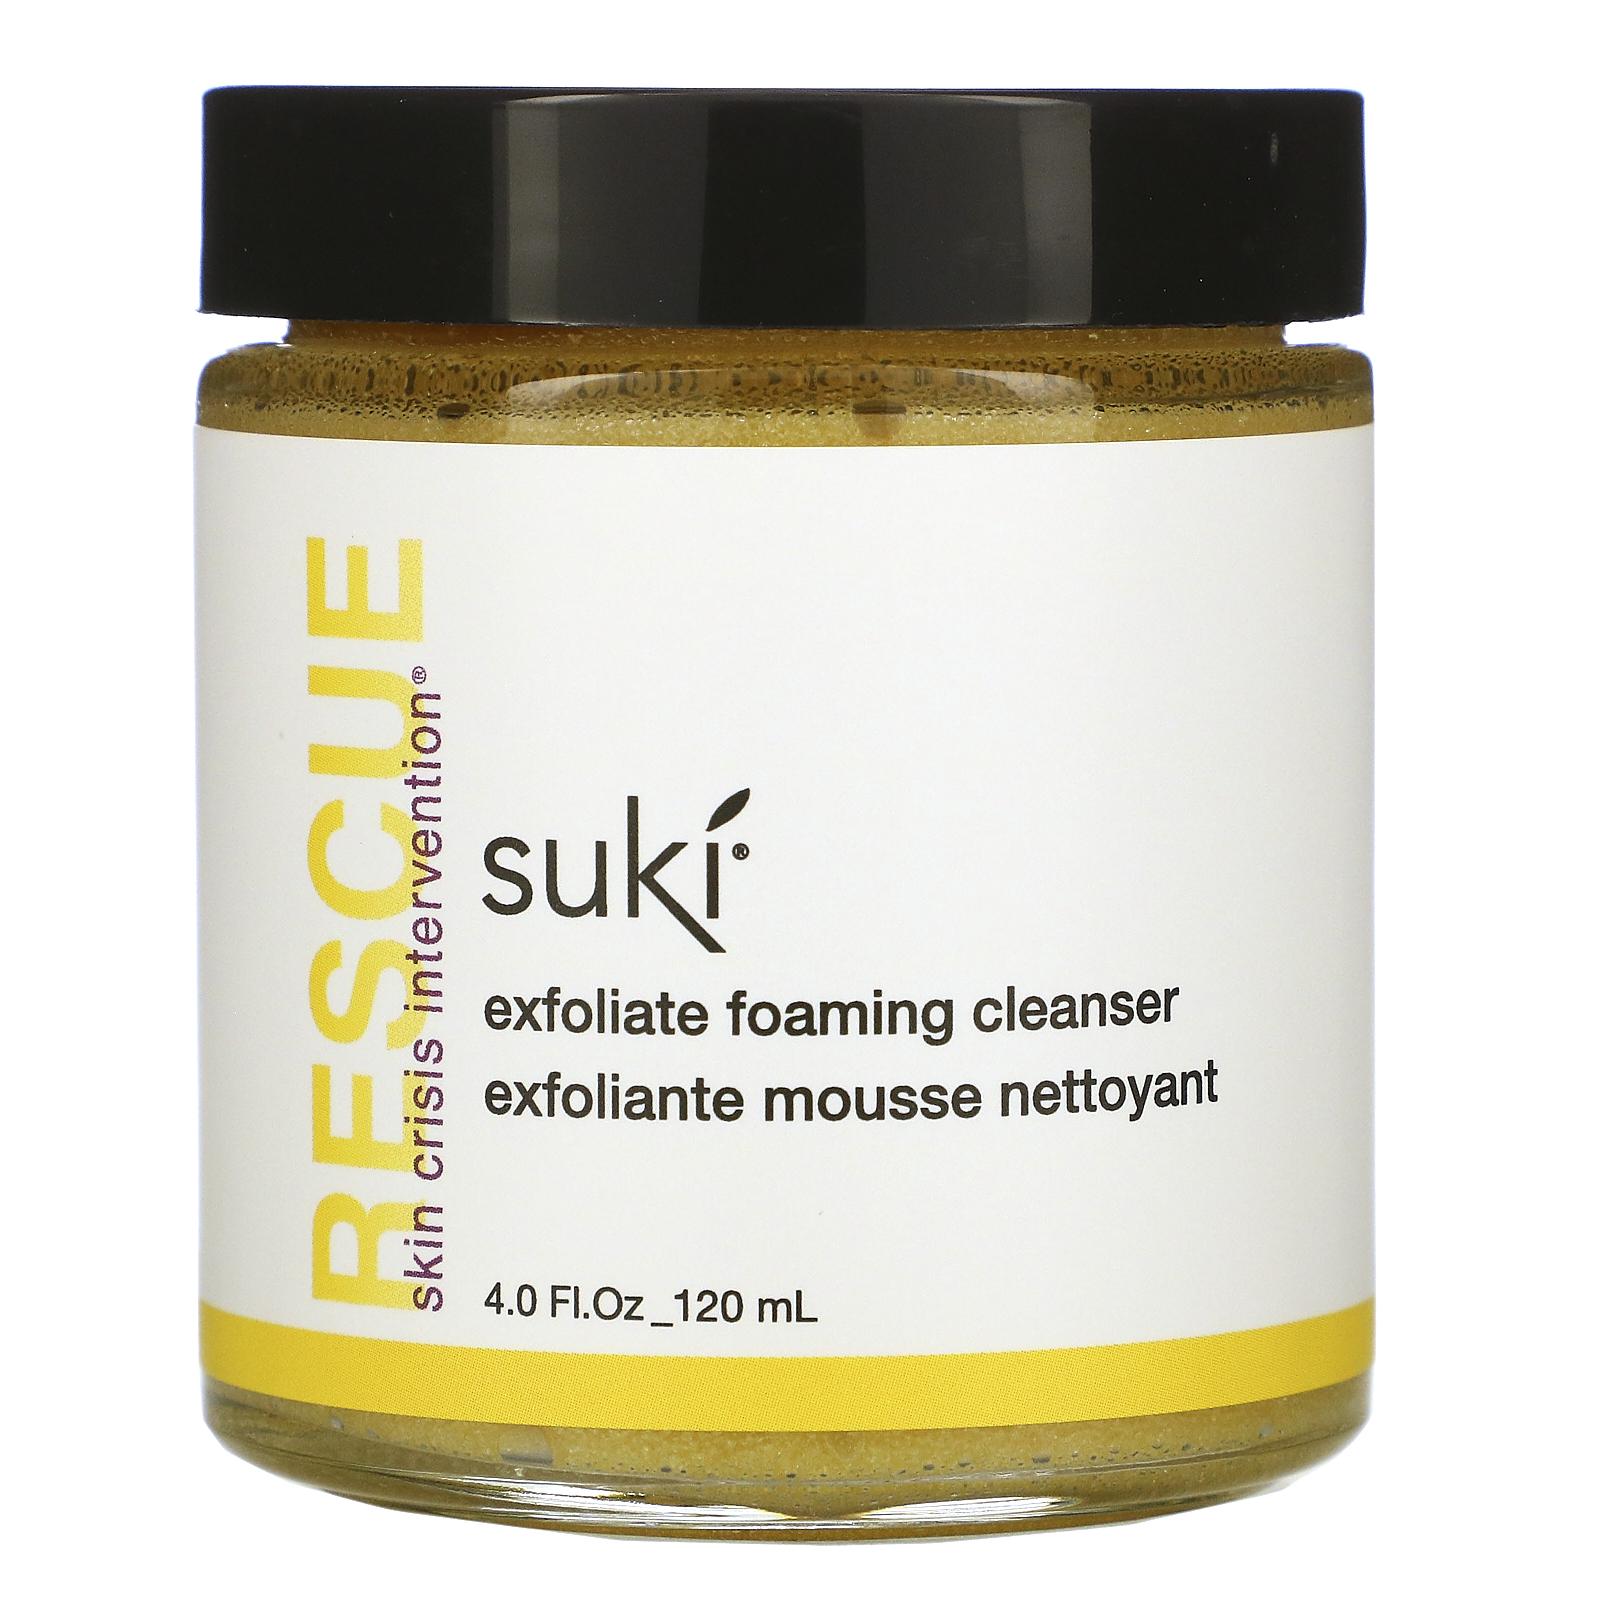 Suki, レスキュー、ピーリング発泡クレンザー、120ml(4液量オンス)